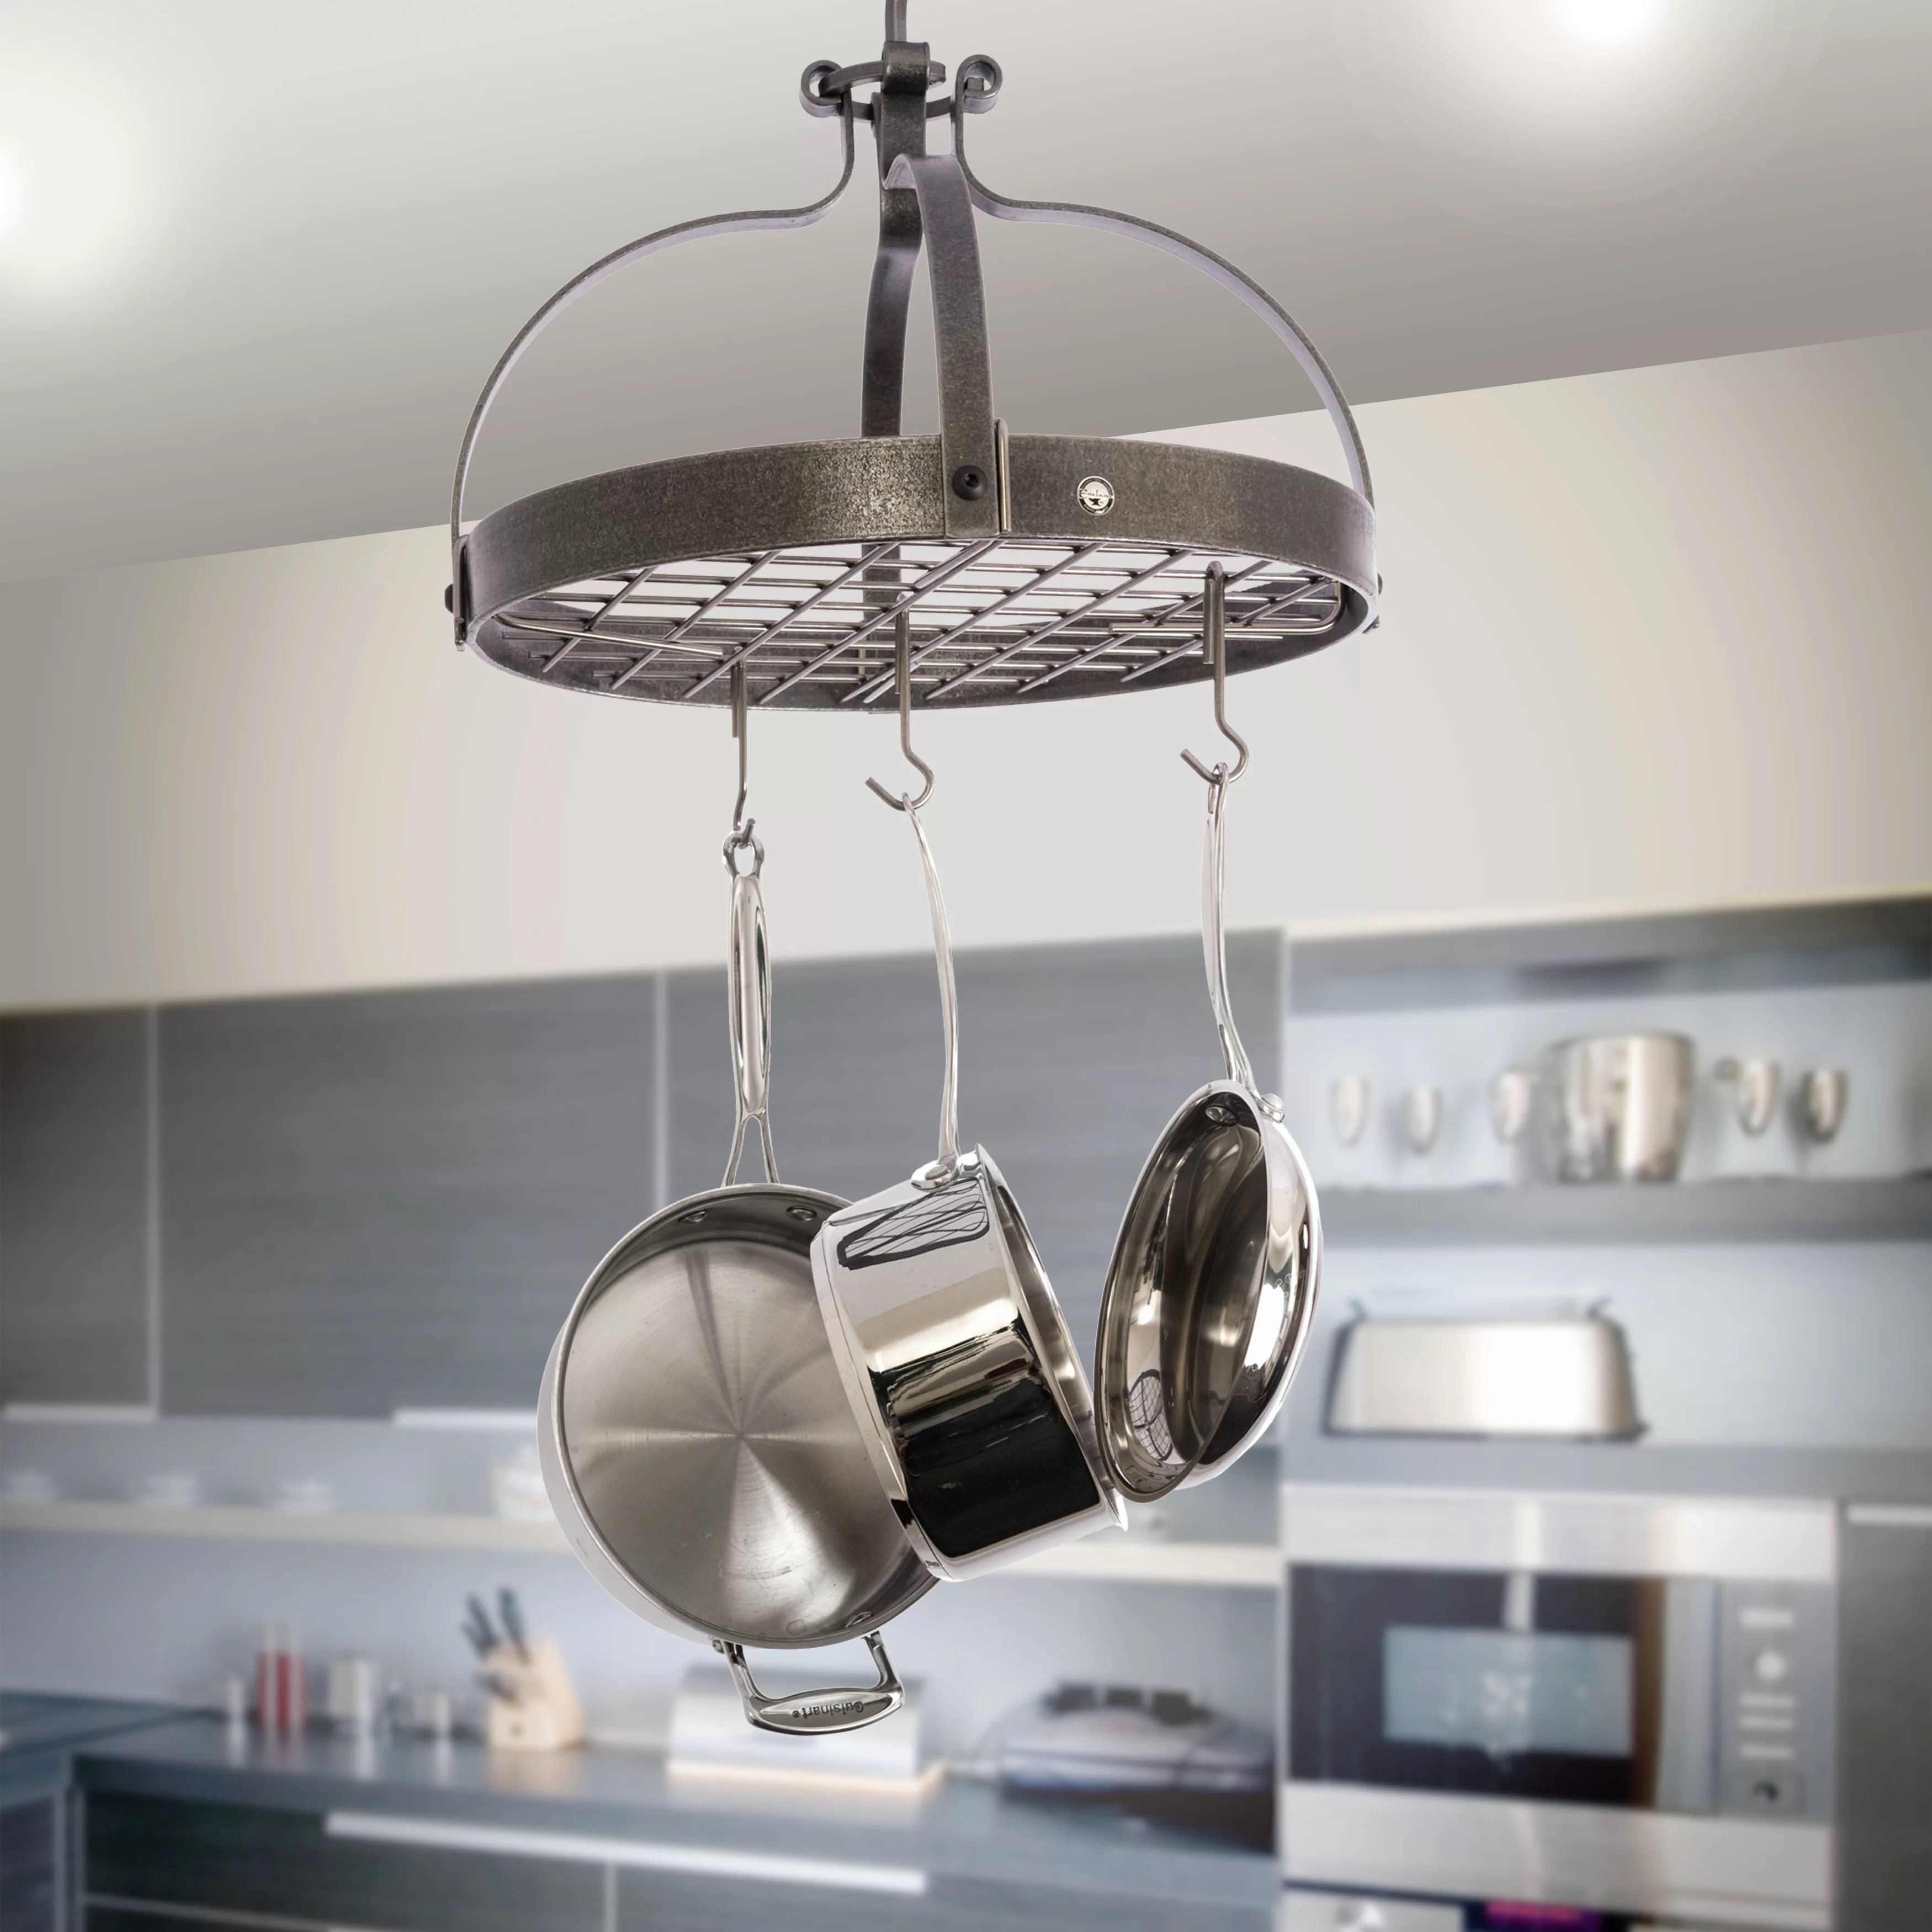 usa handcrafted gourmet dutch crown hanging pot rack